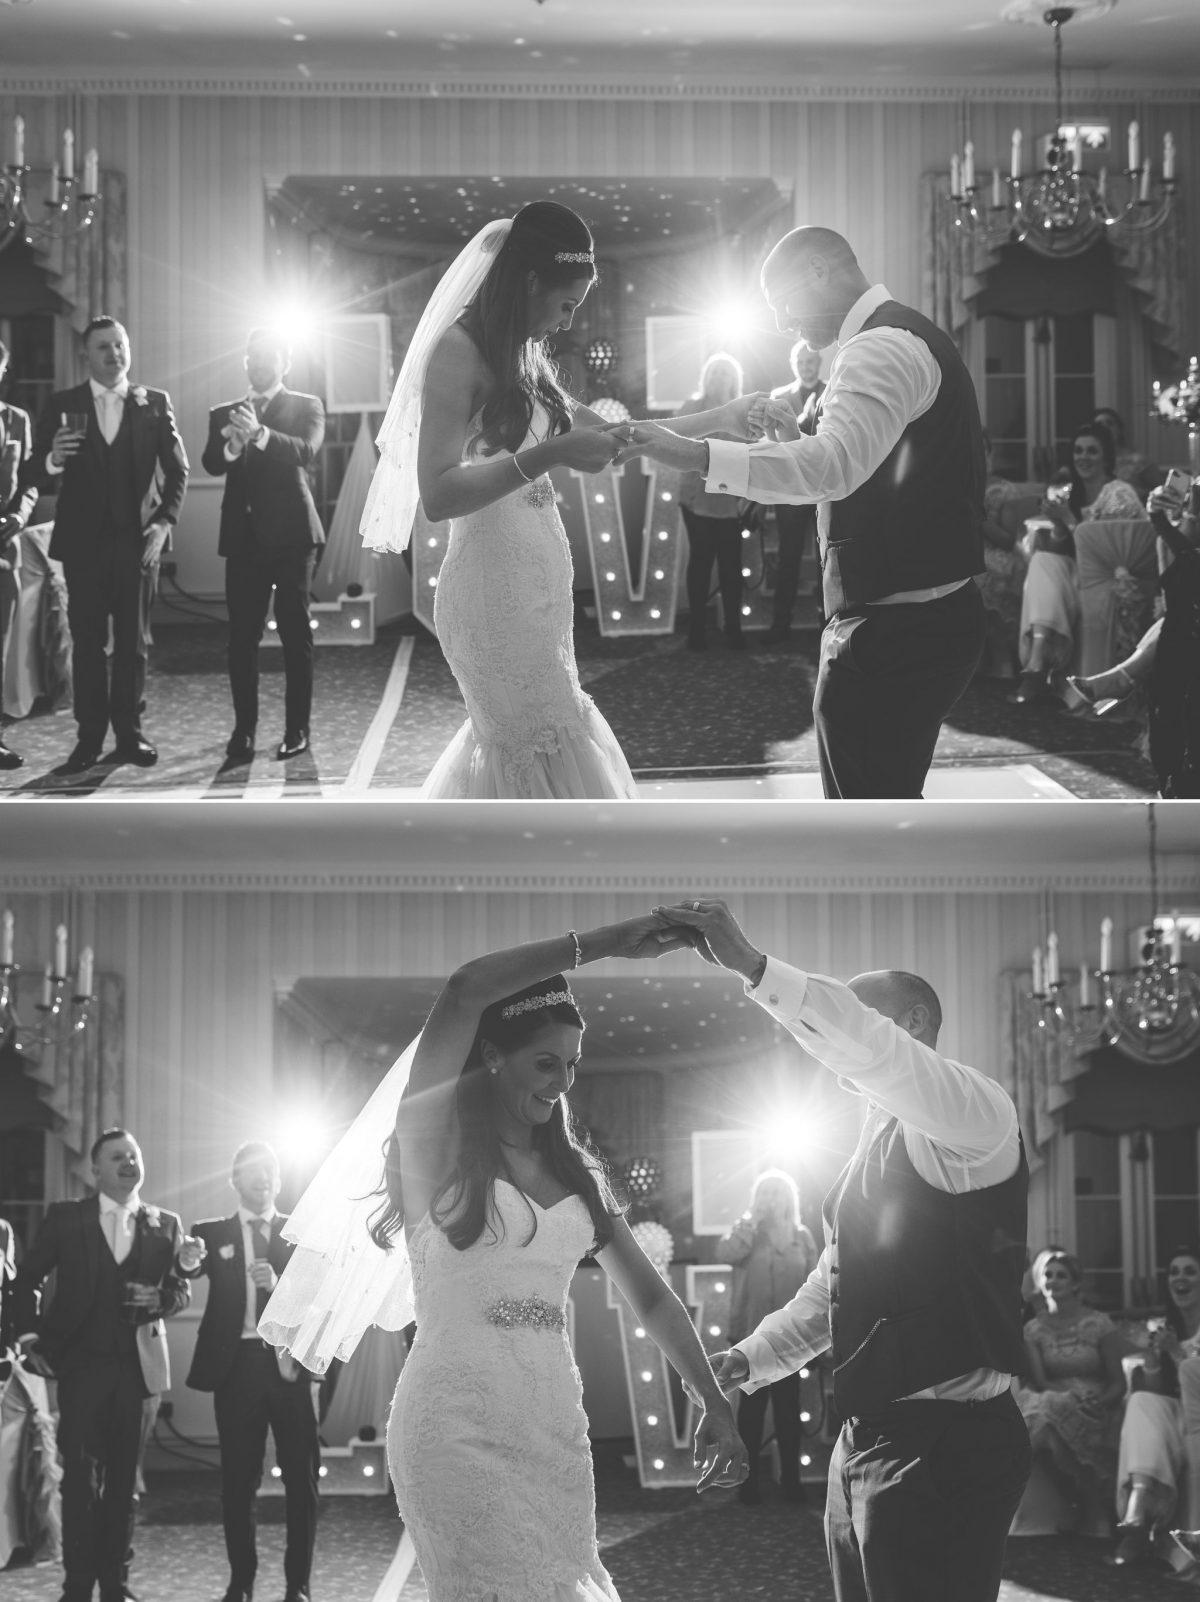 welsh_wedding_photographer_rachel_lambert_photography_decourceys_cardiff_rhiannon_gavin_ 88